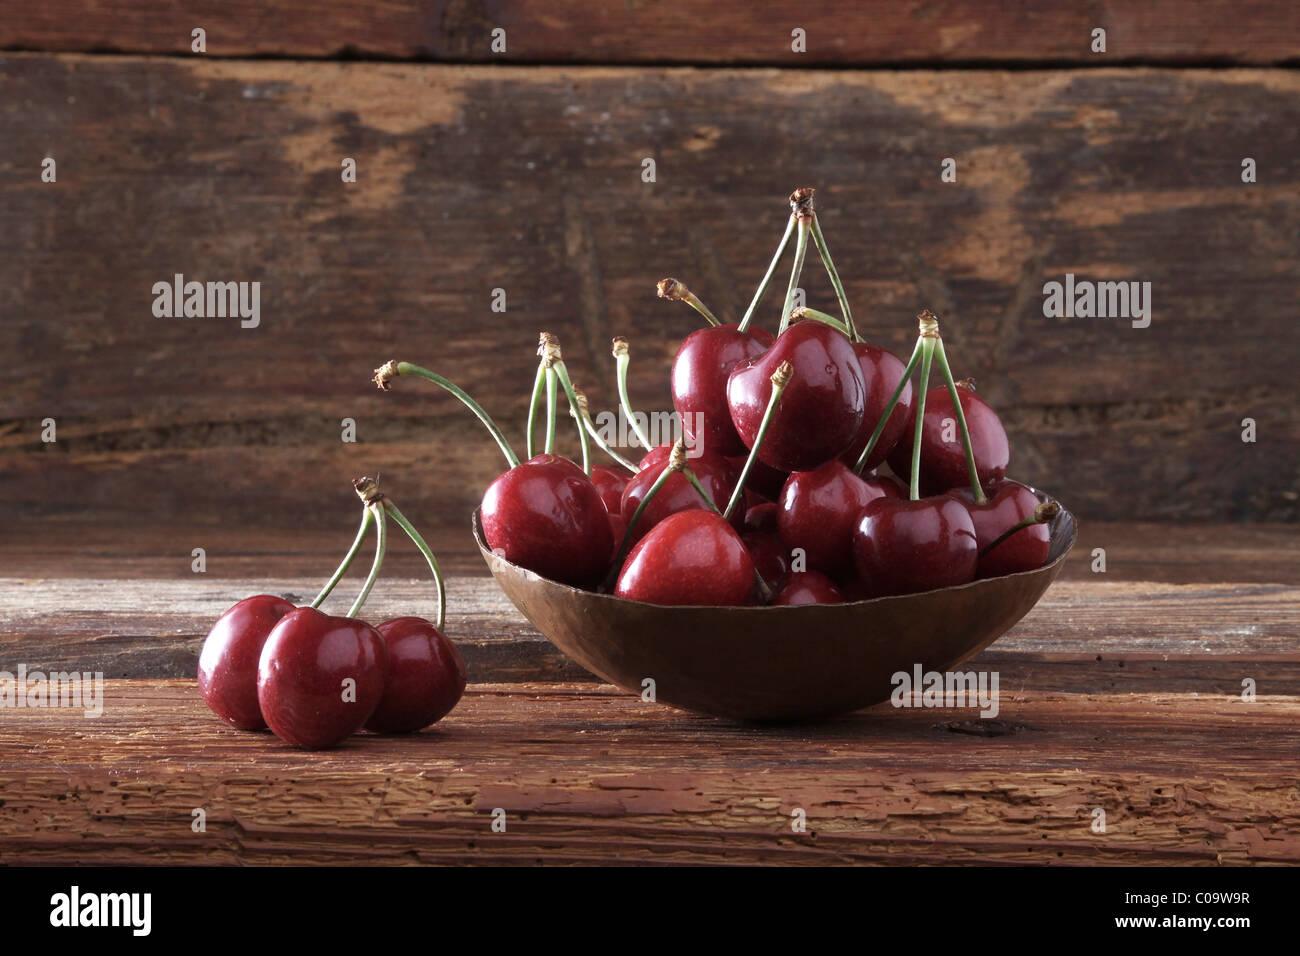 Bowl of Cherries (Prunus) in front of rustic wood - Stock Image